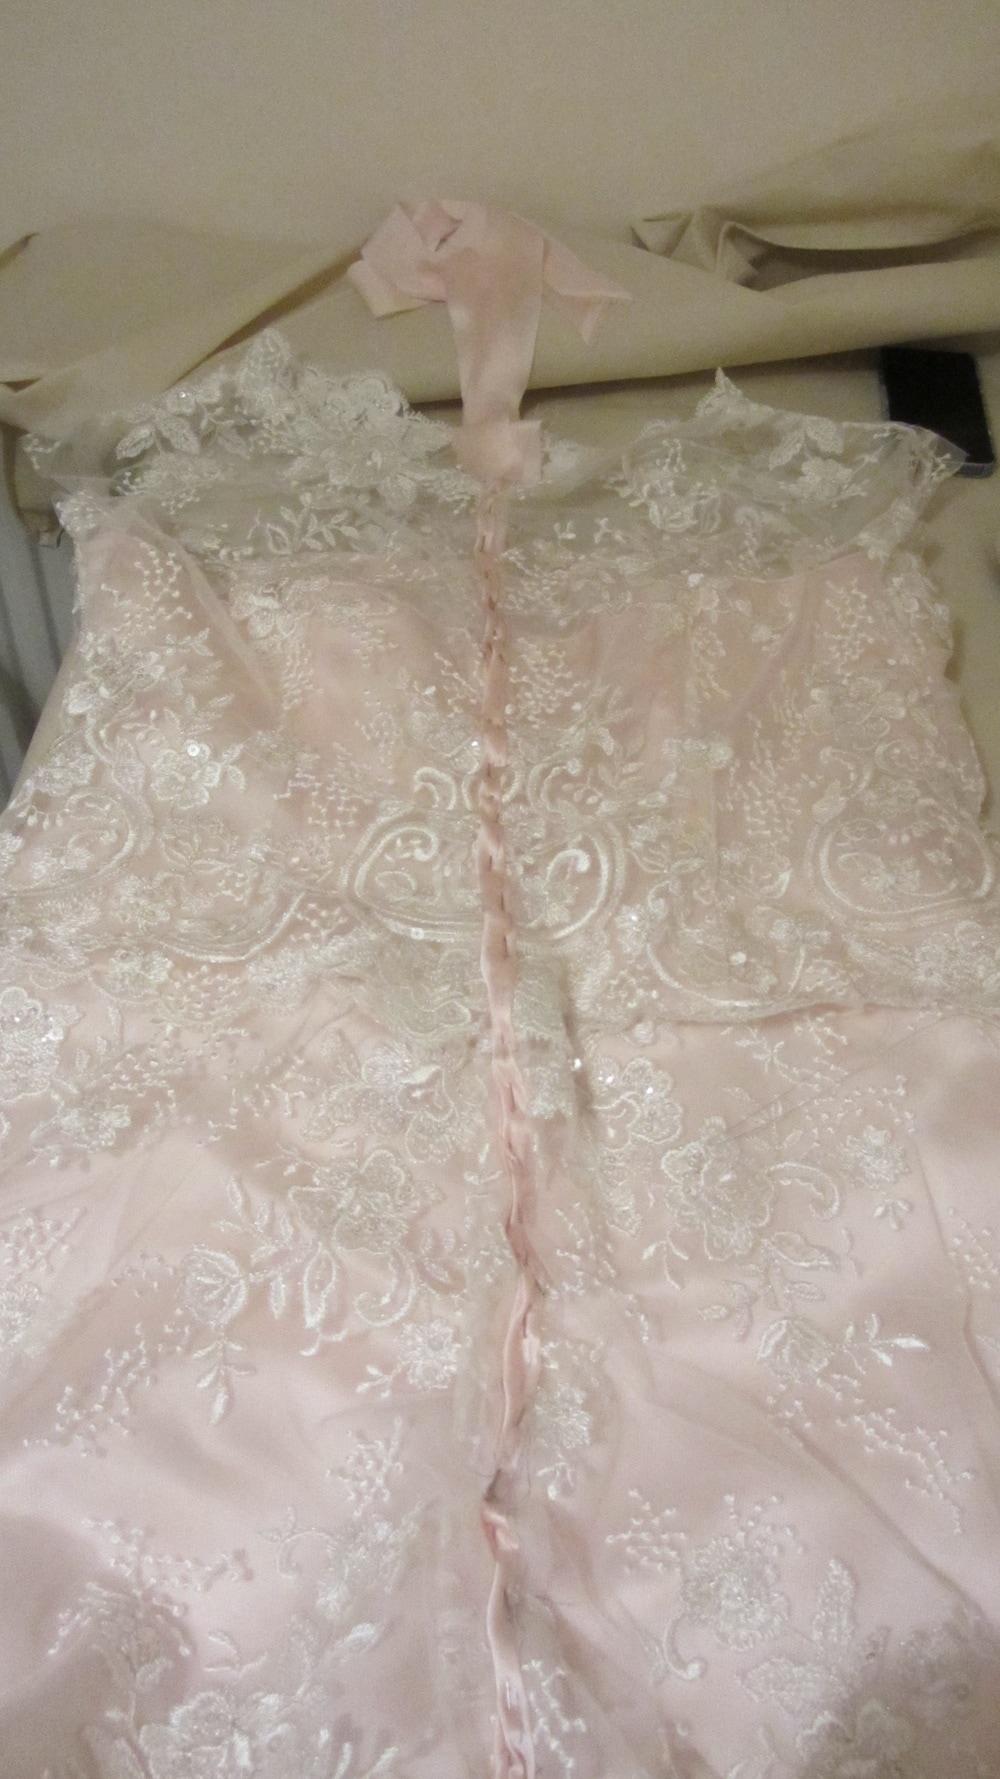 Handmade wedding dress back.jpg